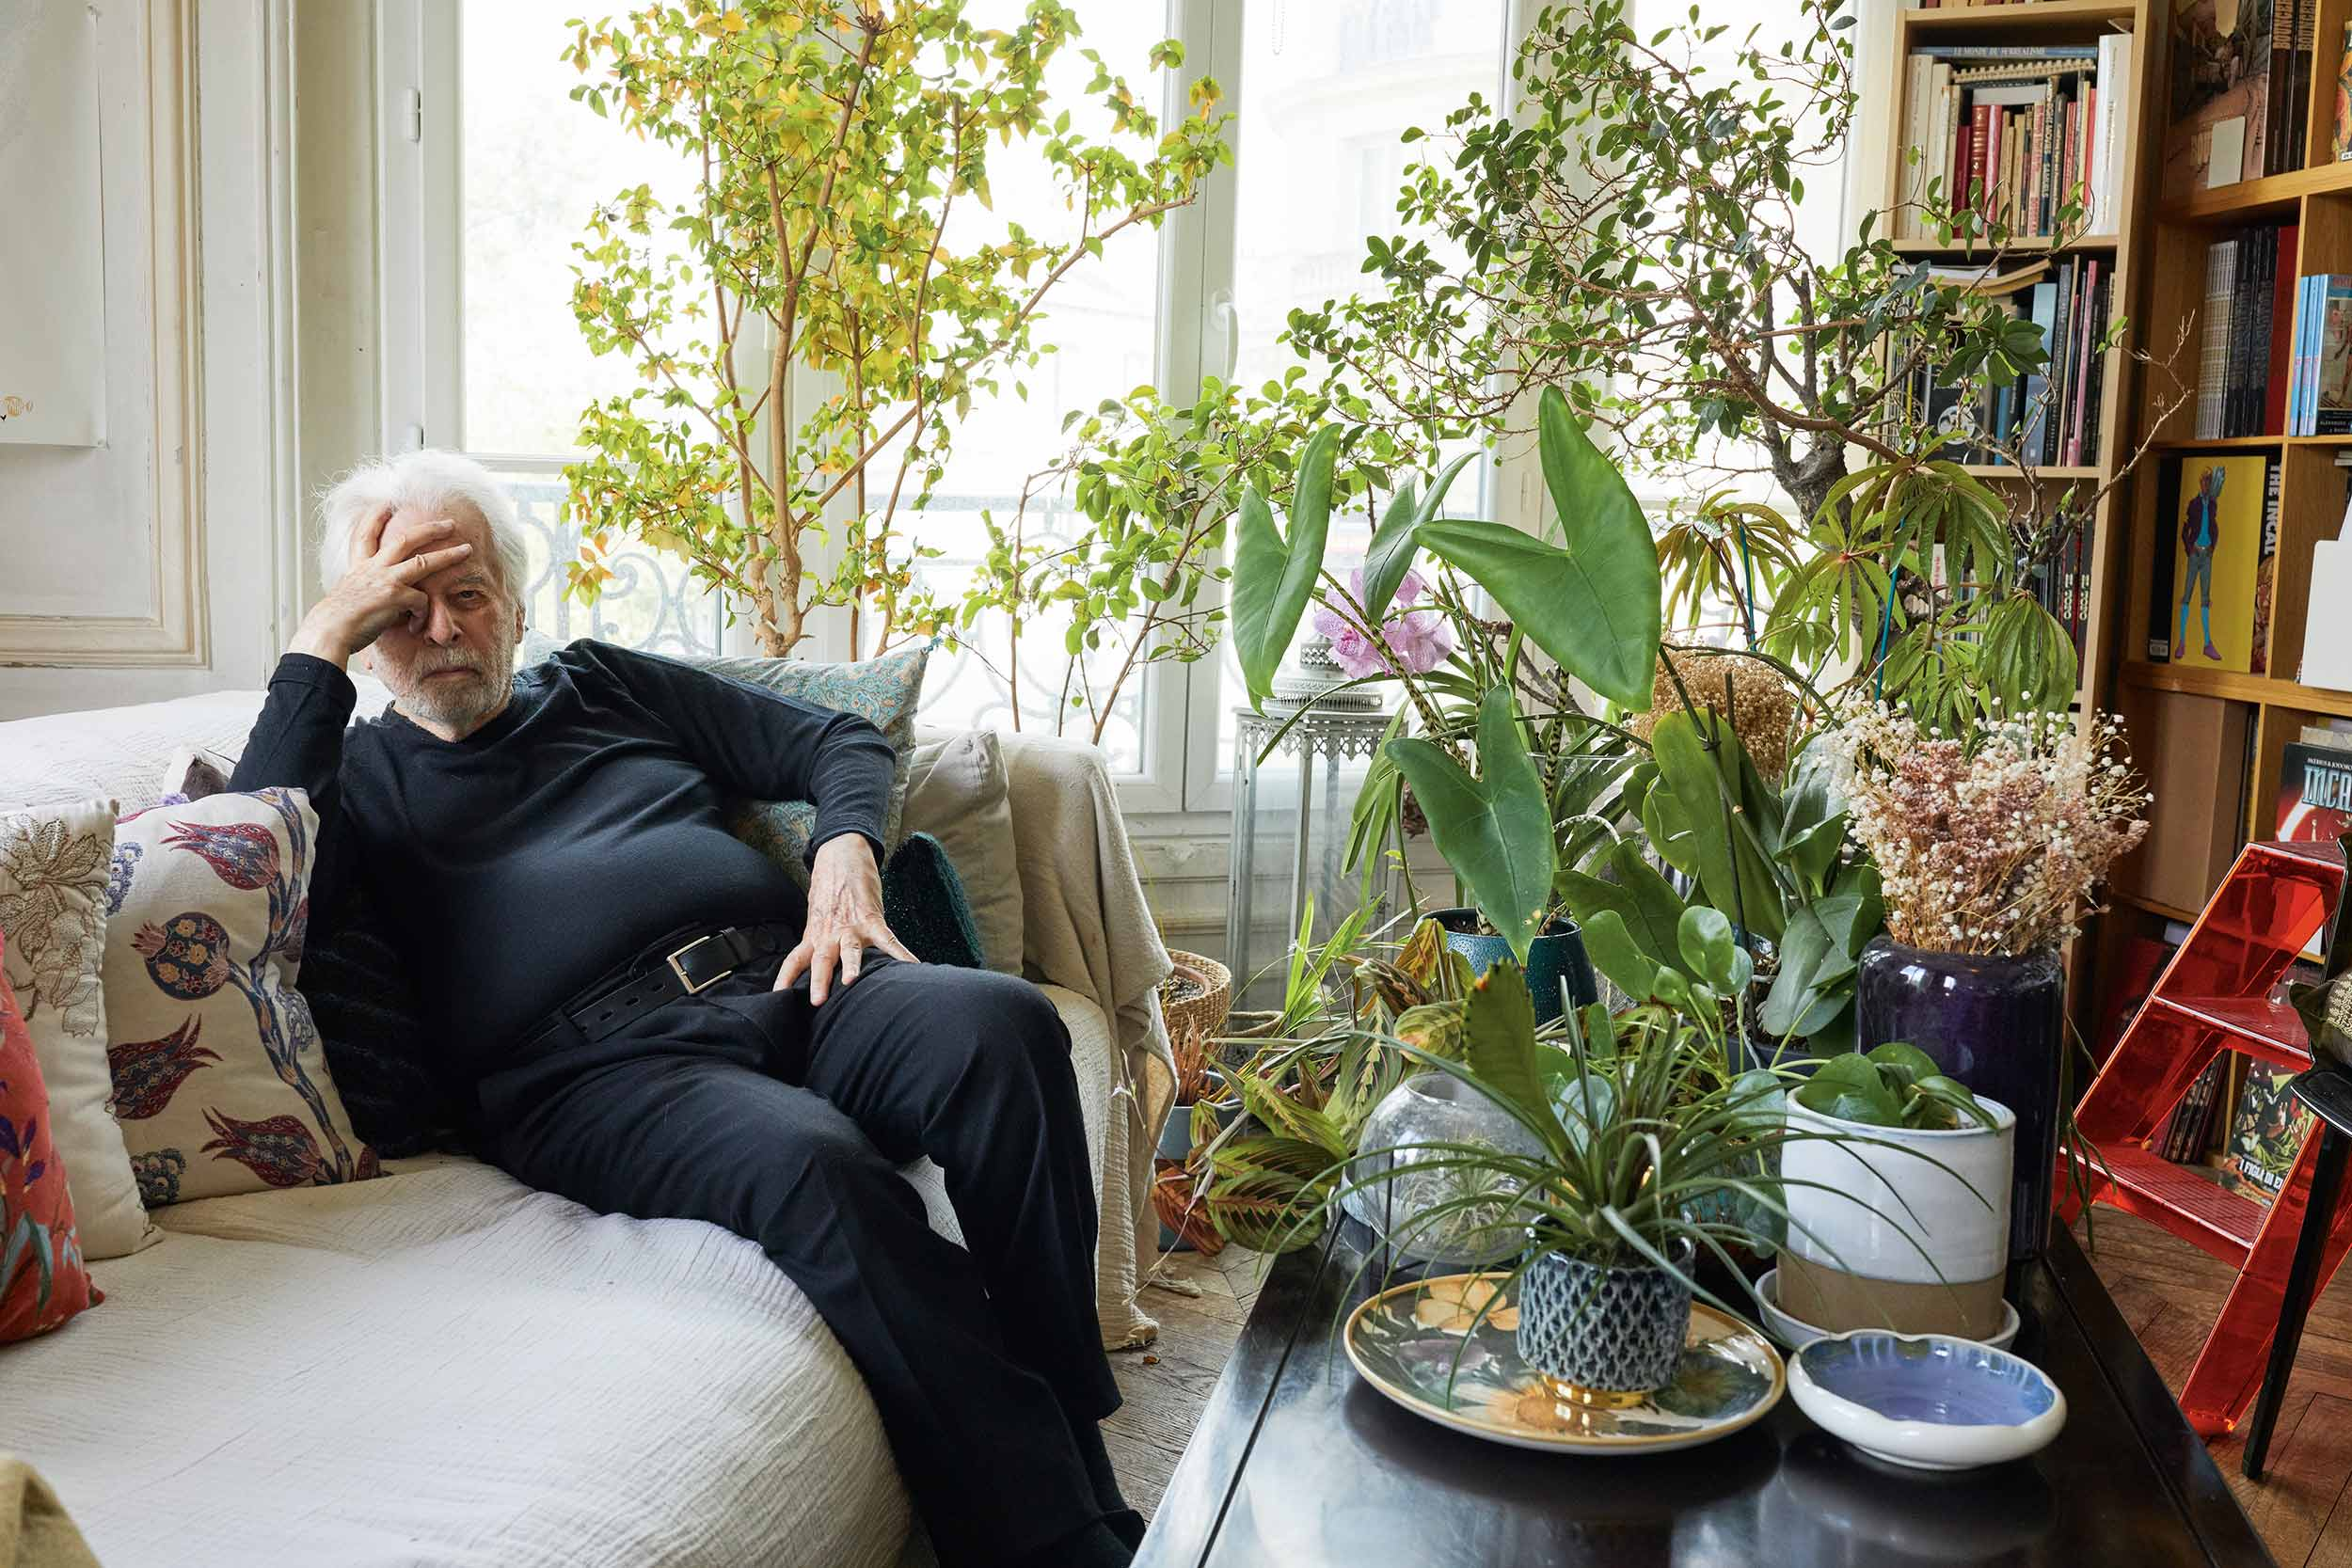 Alejandro Jodorowsky interrogates the primal source of human desire